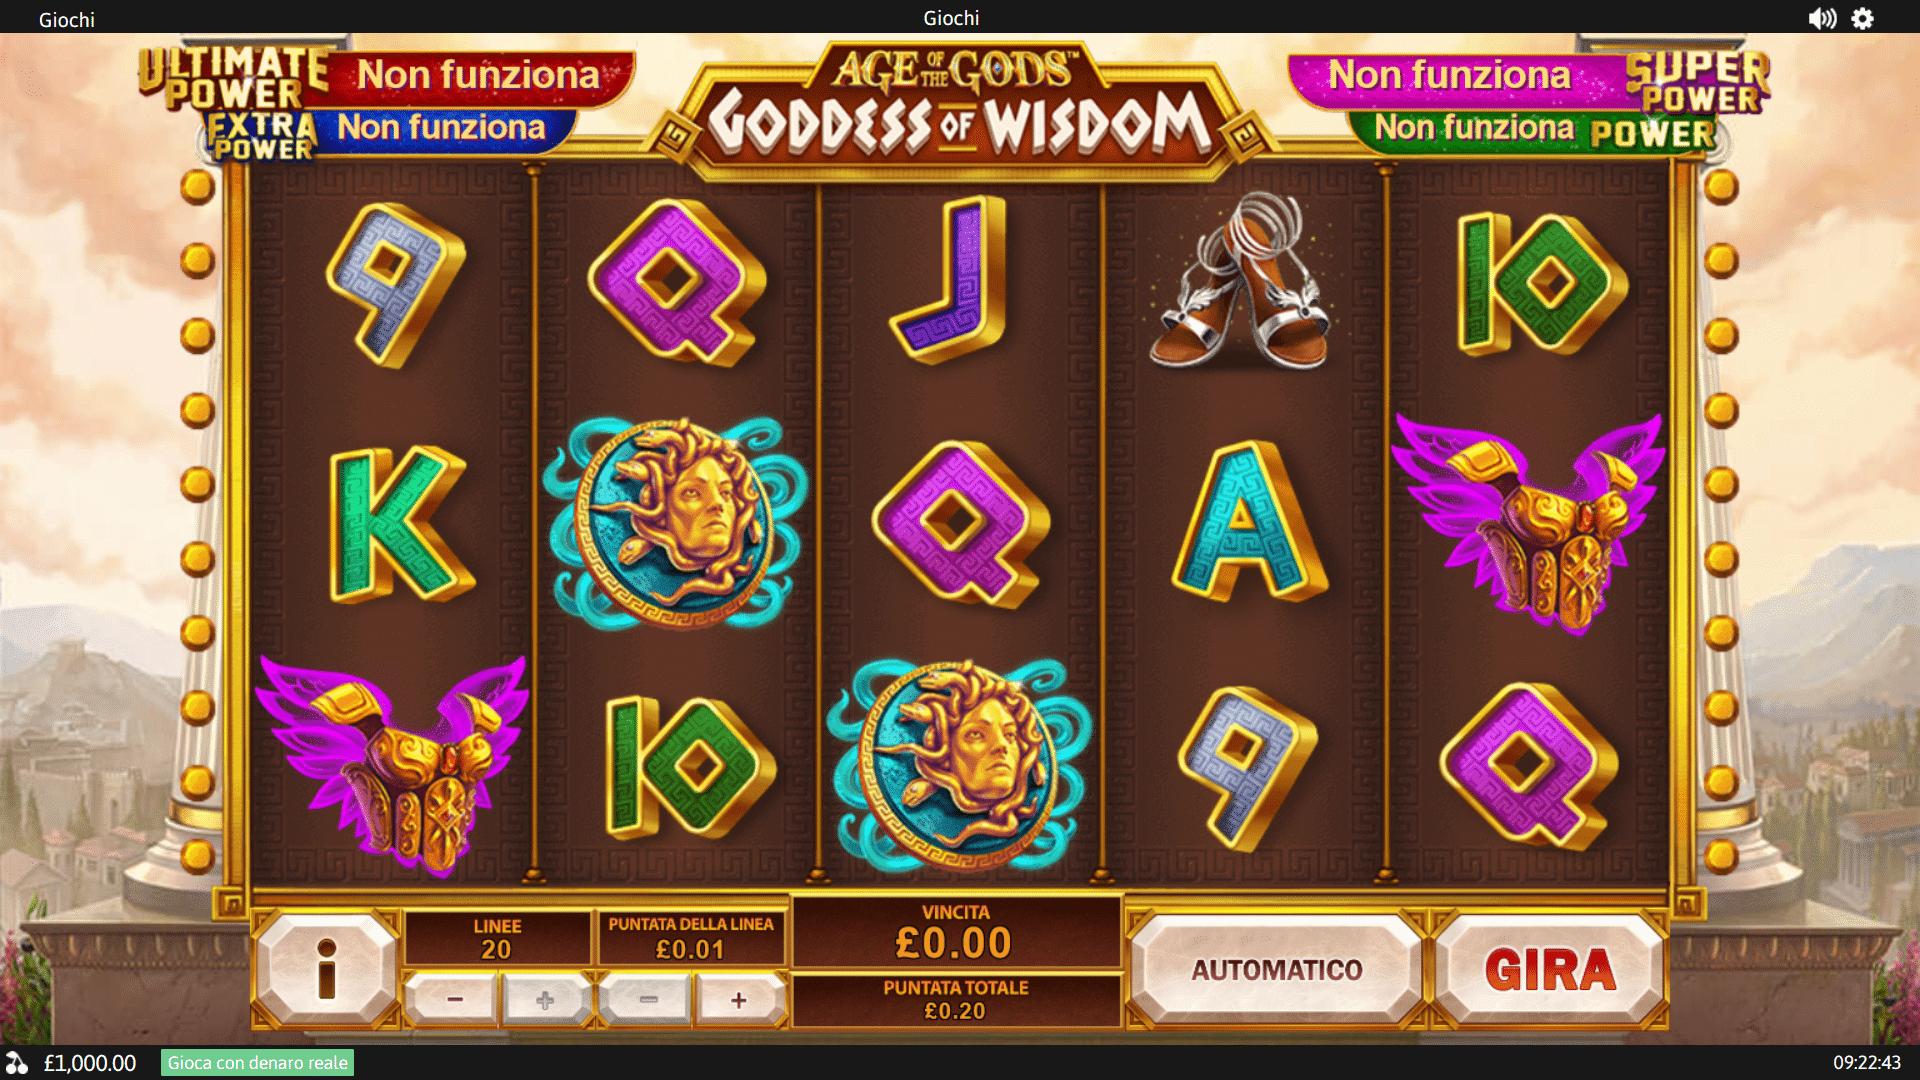 Slot Age of the Gods Goddess of Wisdom